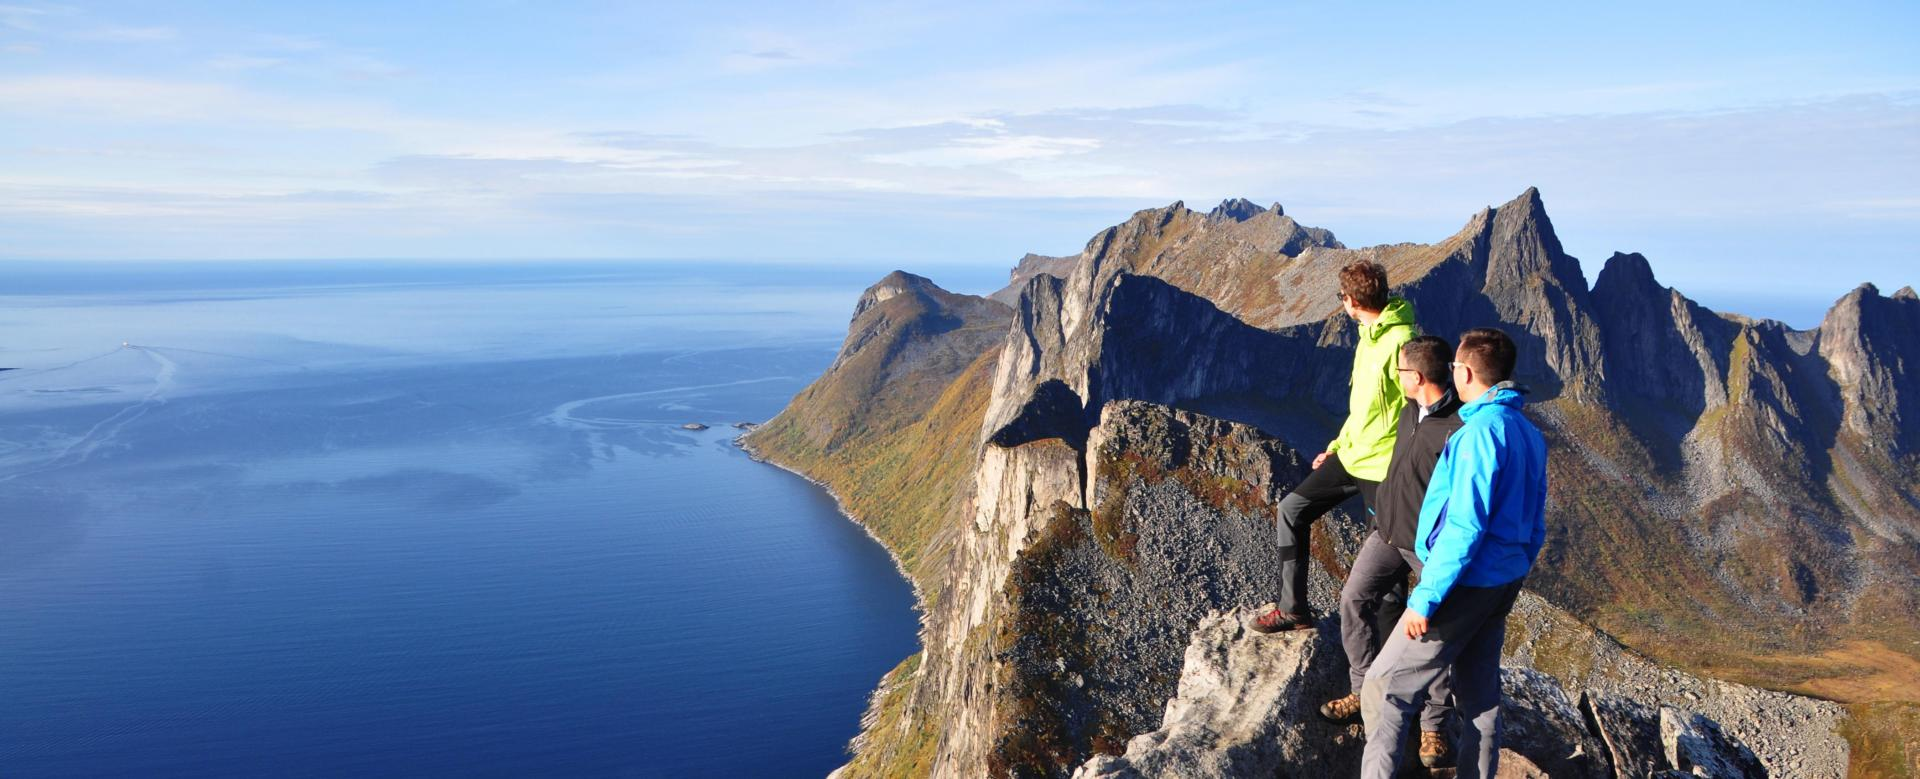 Voyage à pied : Norvège : Archipels du nord : senja, vesterålen et lofoten